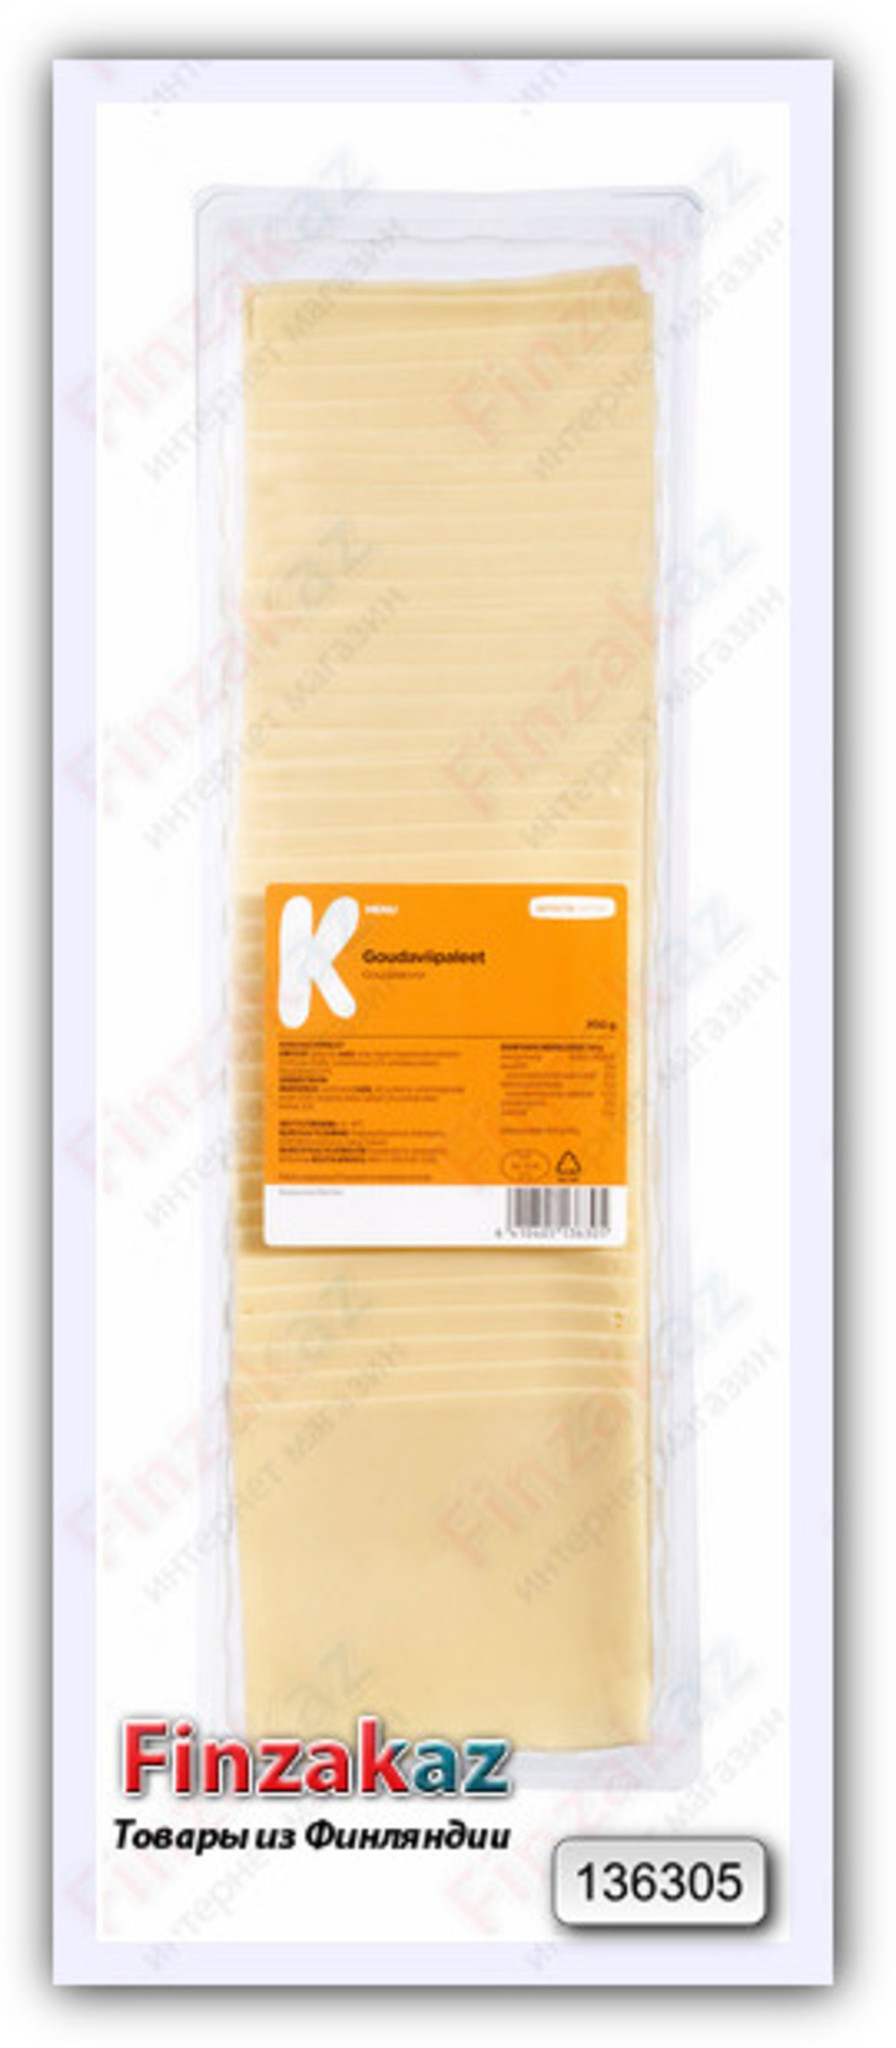 Сыр Гауда в нарезке K-Menu 700 гр